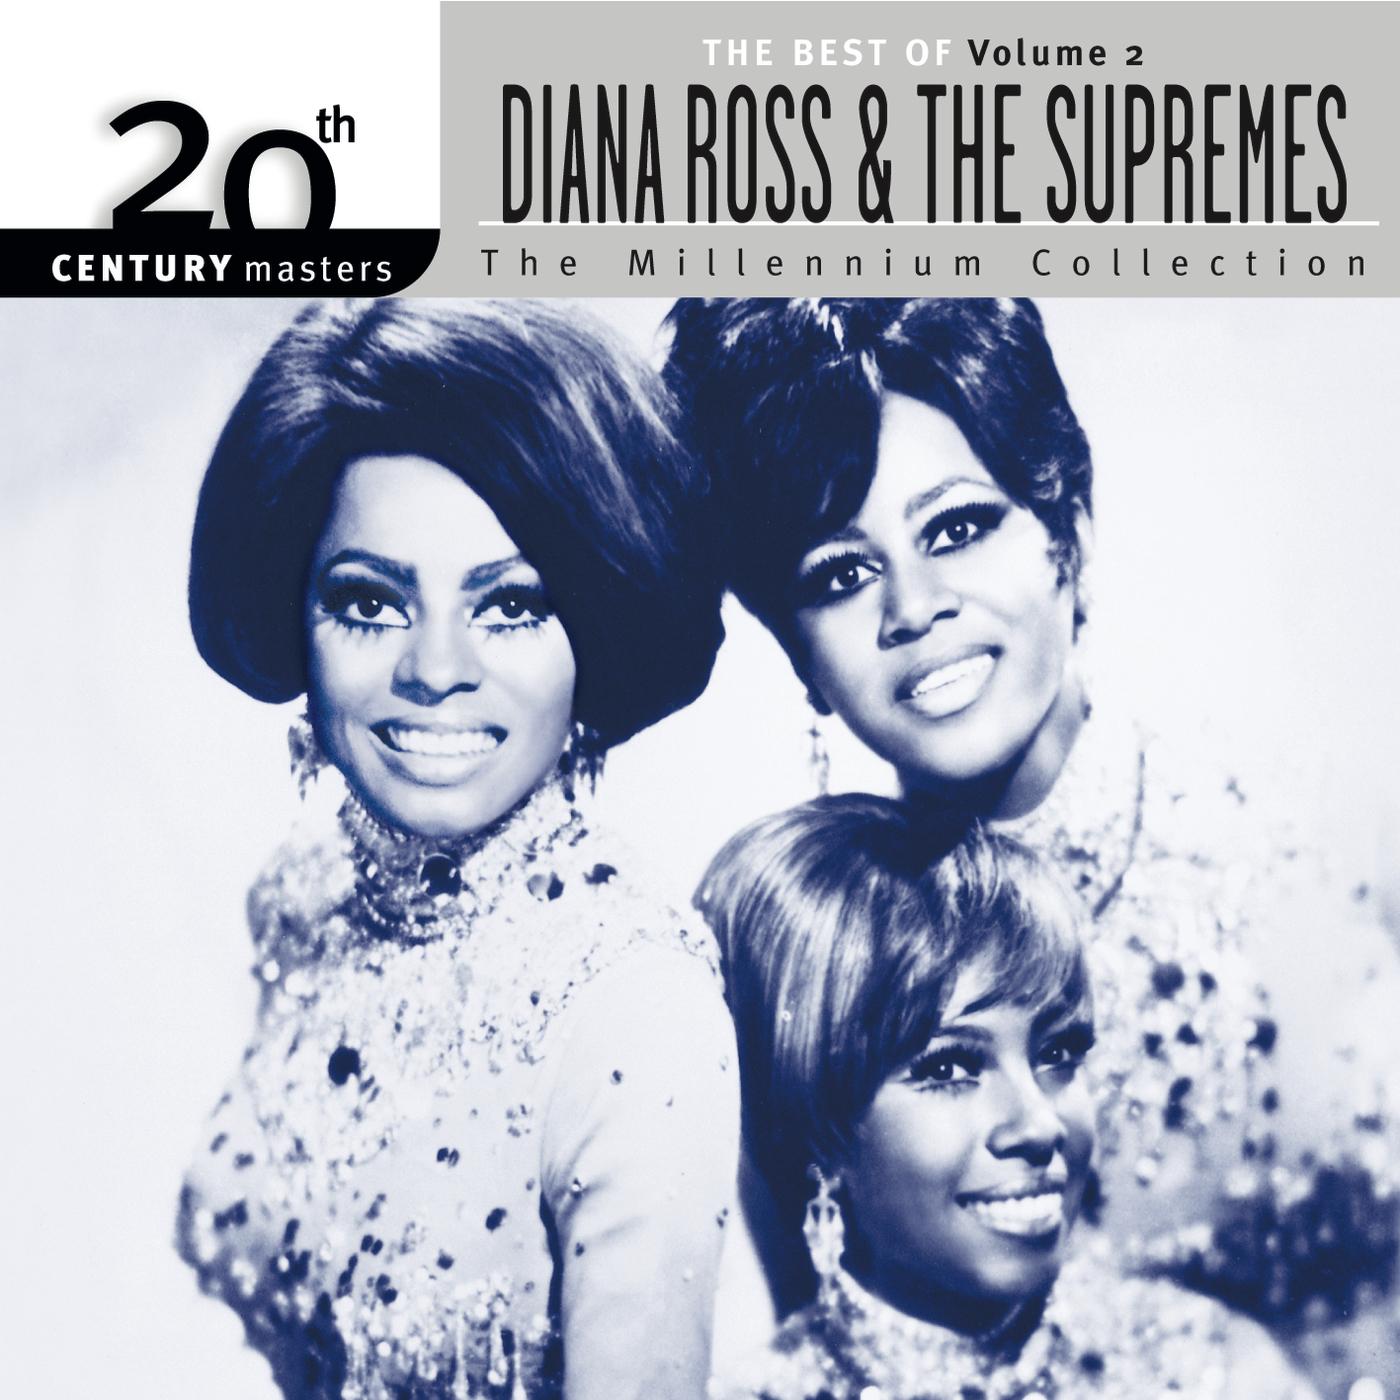 Ross Diana 1 Supremes Vol